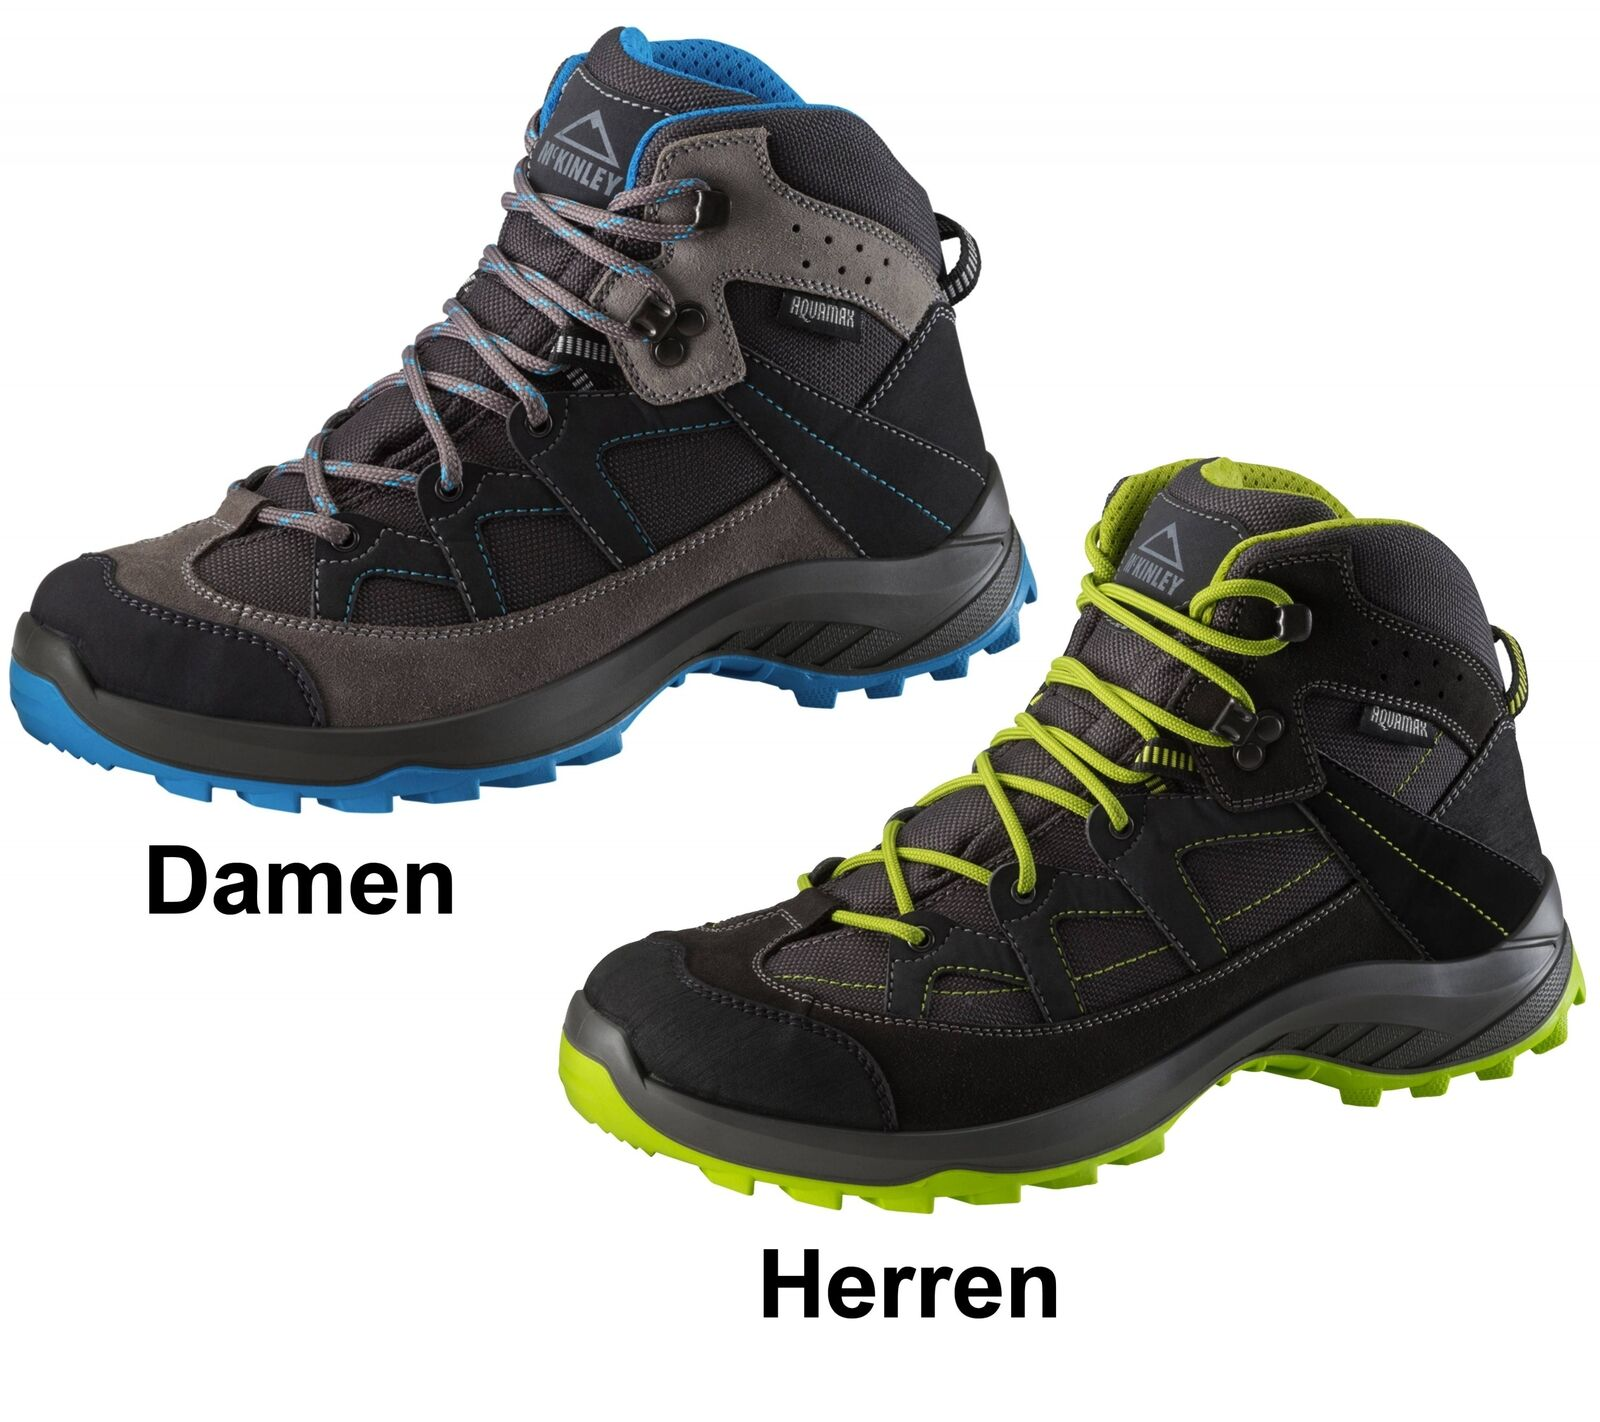 McKinly Leder Outdoor Wander Trekking Schuhe Discover Mid Aquamax Membrane Neu